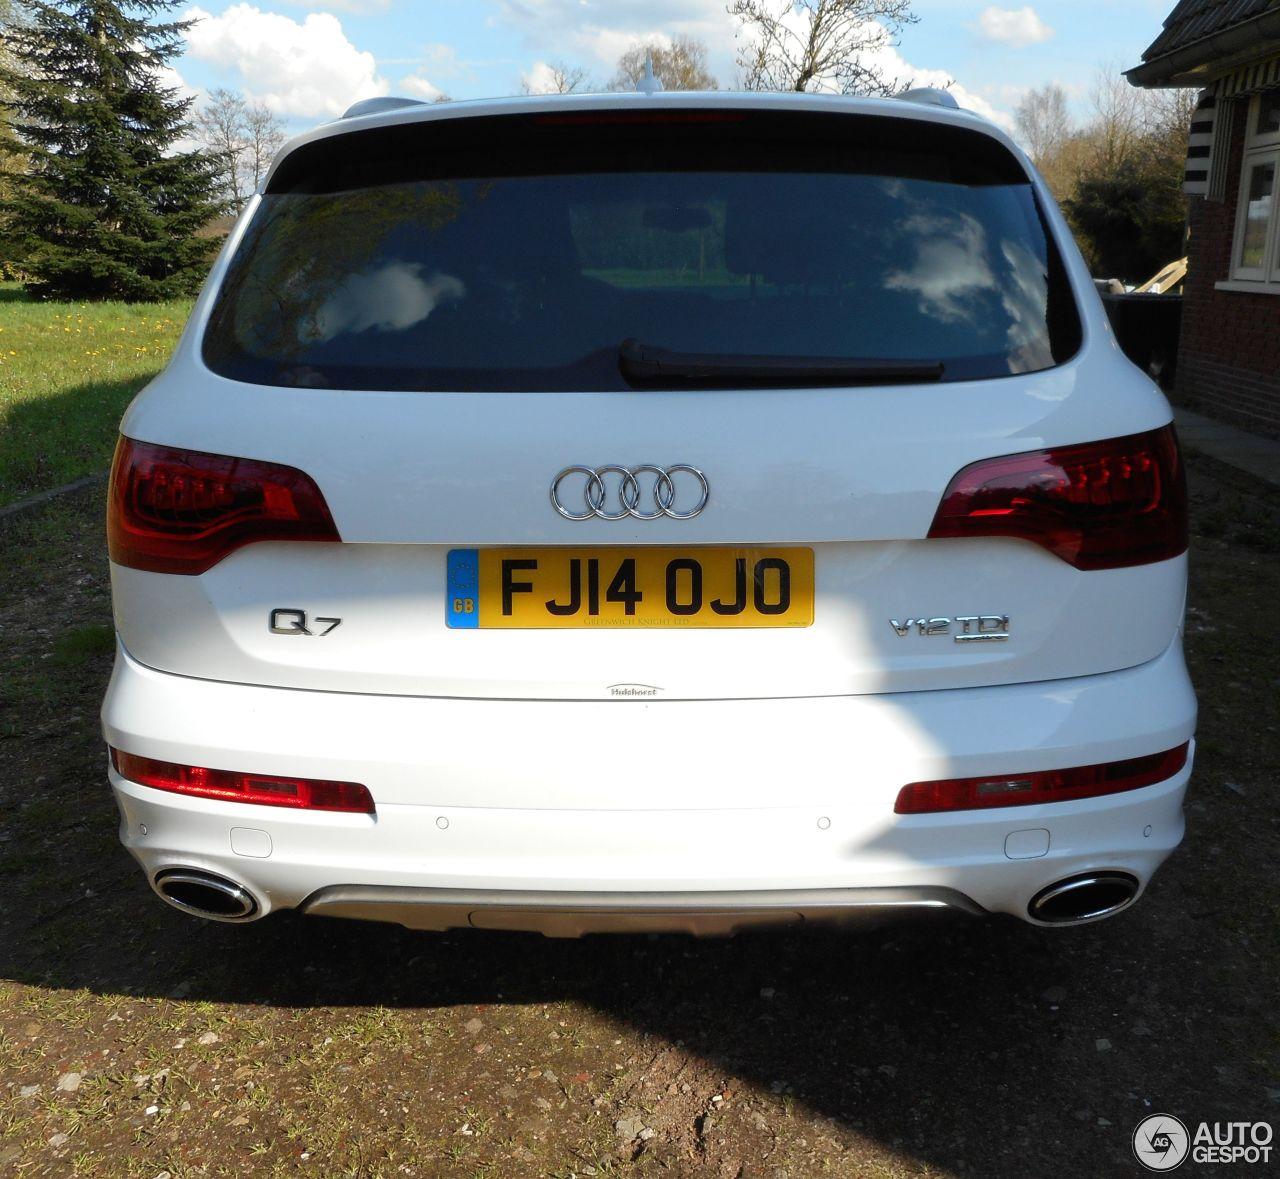 Audi Q7 Diesel: Audi Q7 V12 TDI